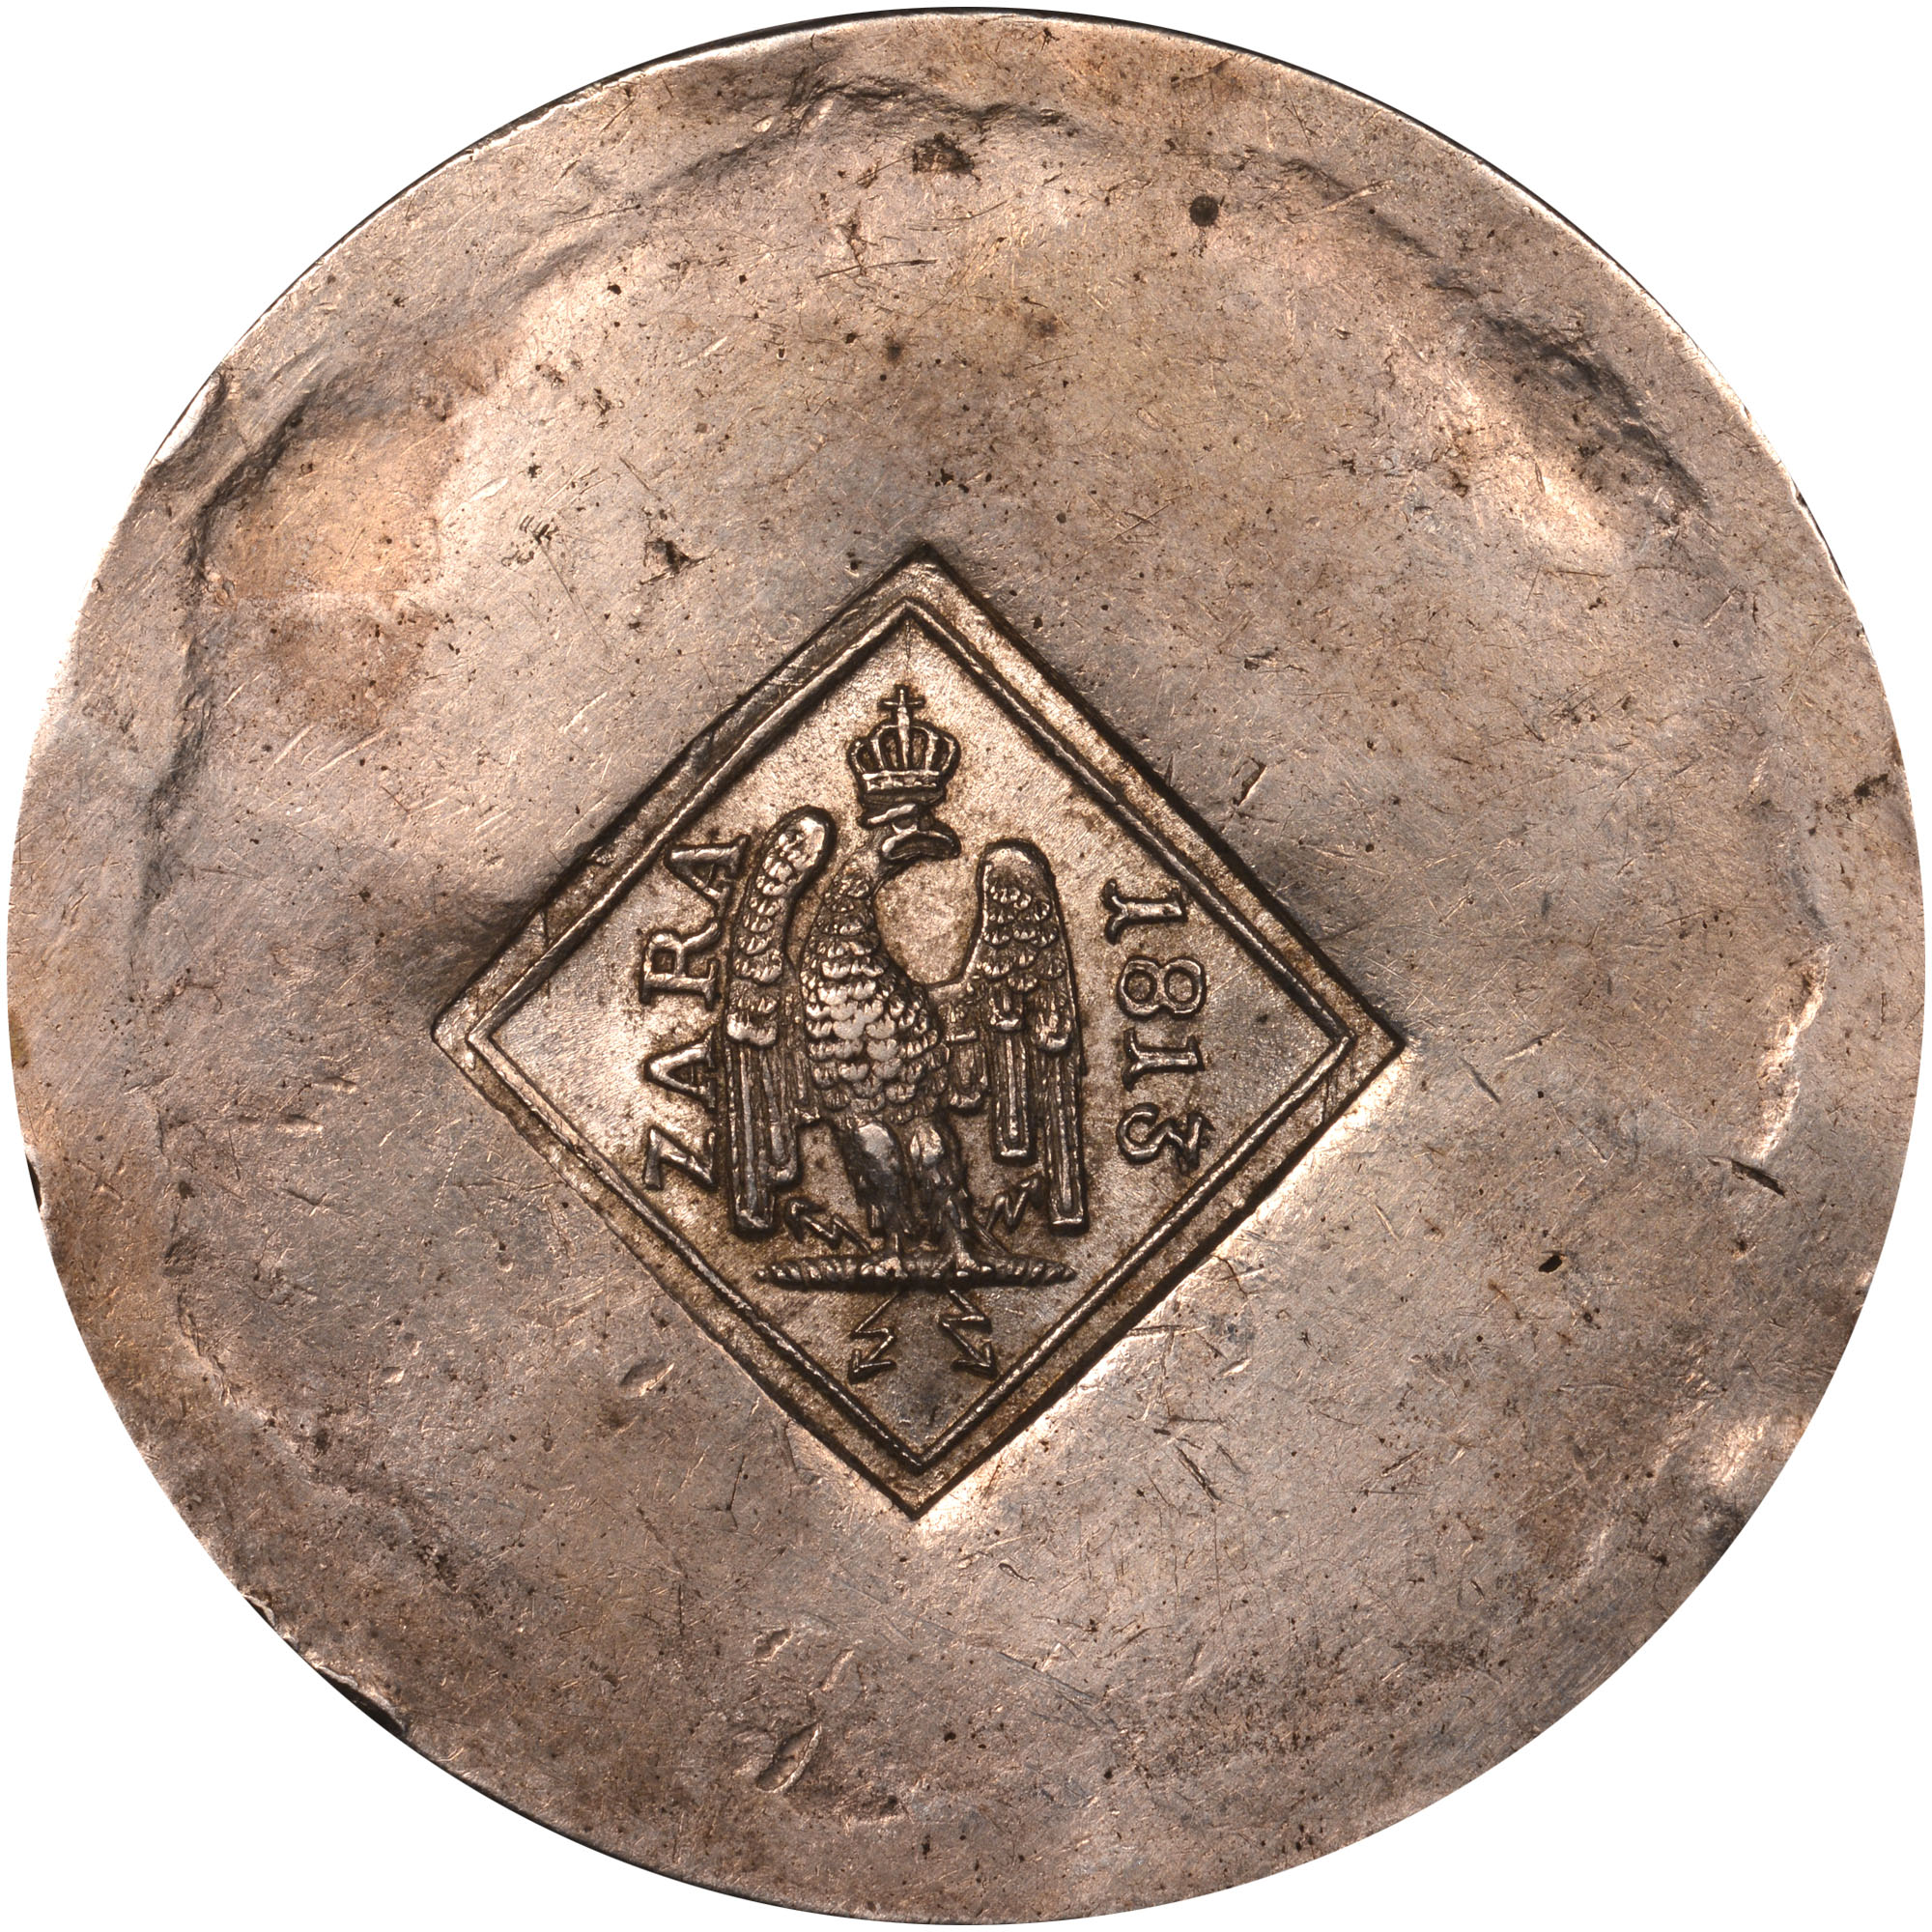 1813 Croatia ZARA 9 Francs-20 Centimes obverse